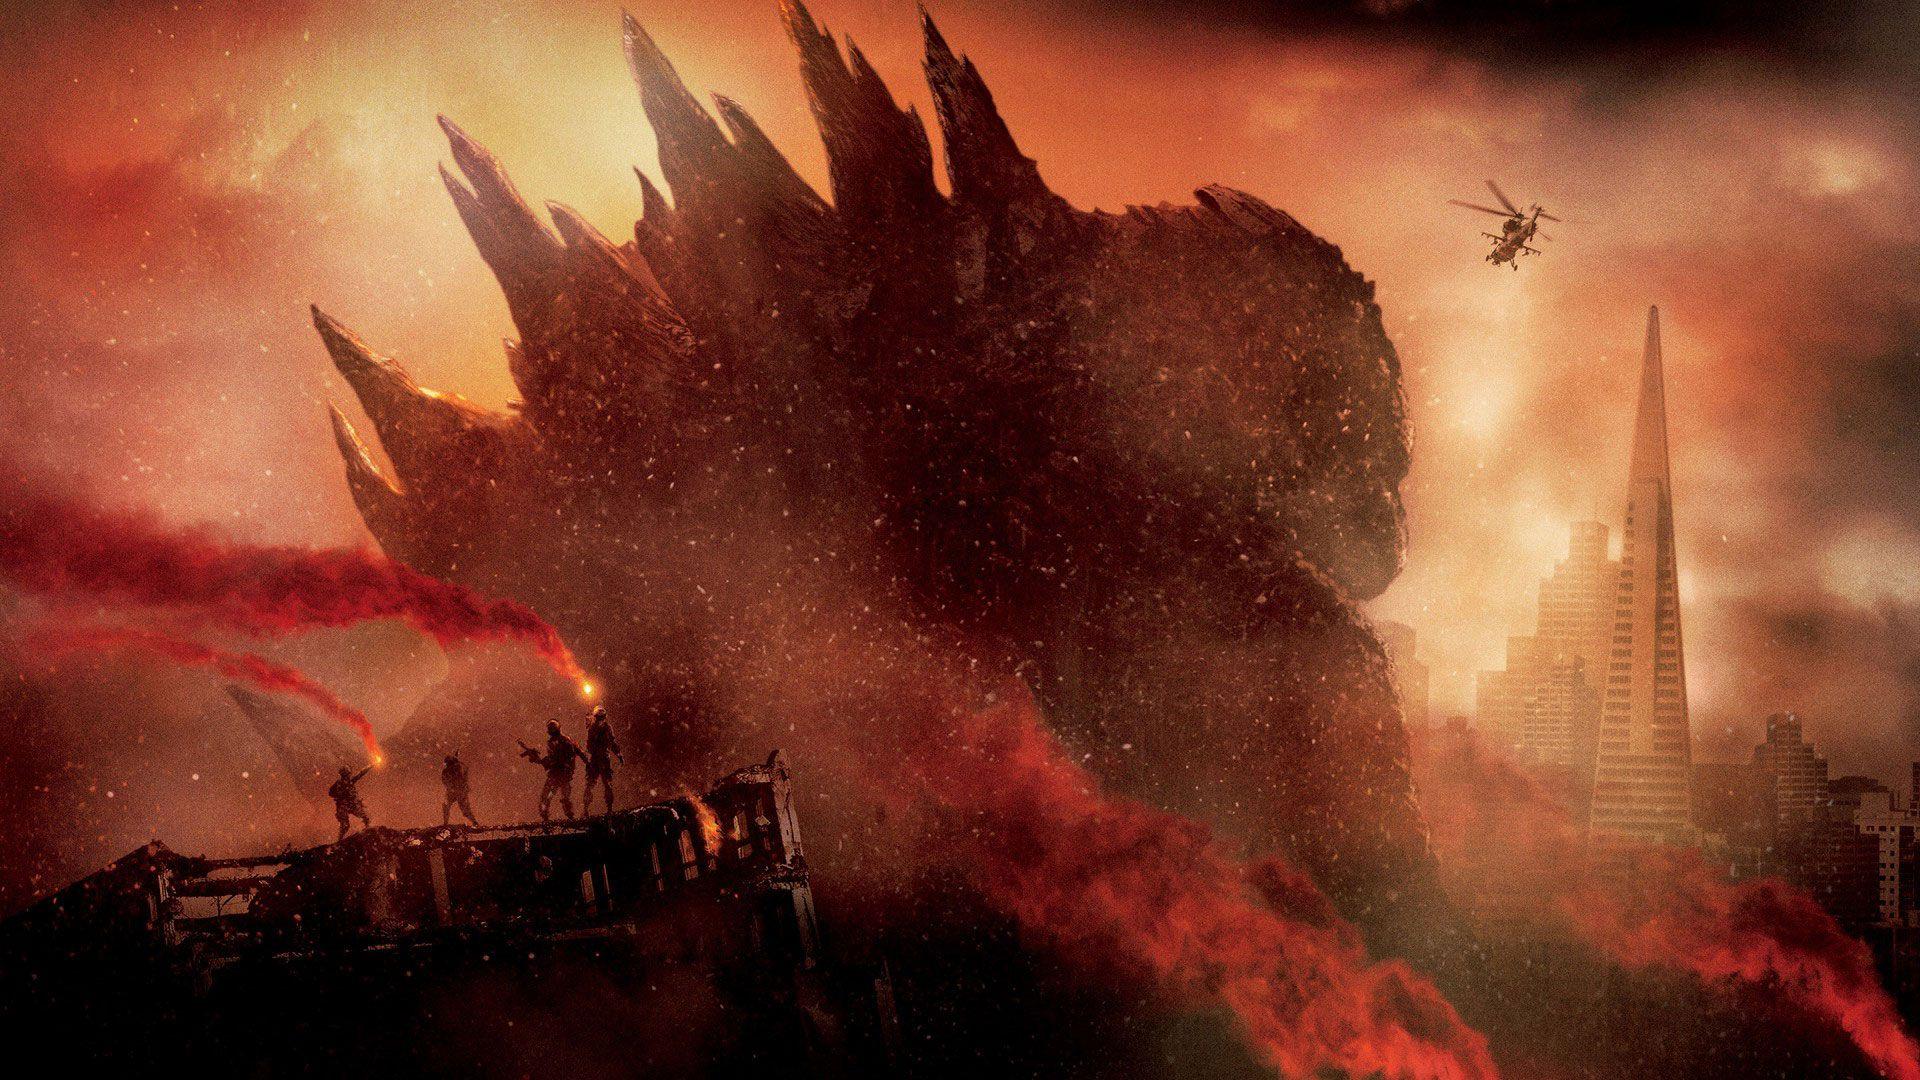 Godzilla Movie 2014 Hd Iphone Ipad Wallpapers Godzilla Wallpaper King Kong Vs Godzilla Godzilla 2014